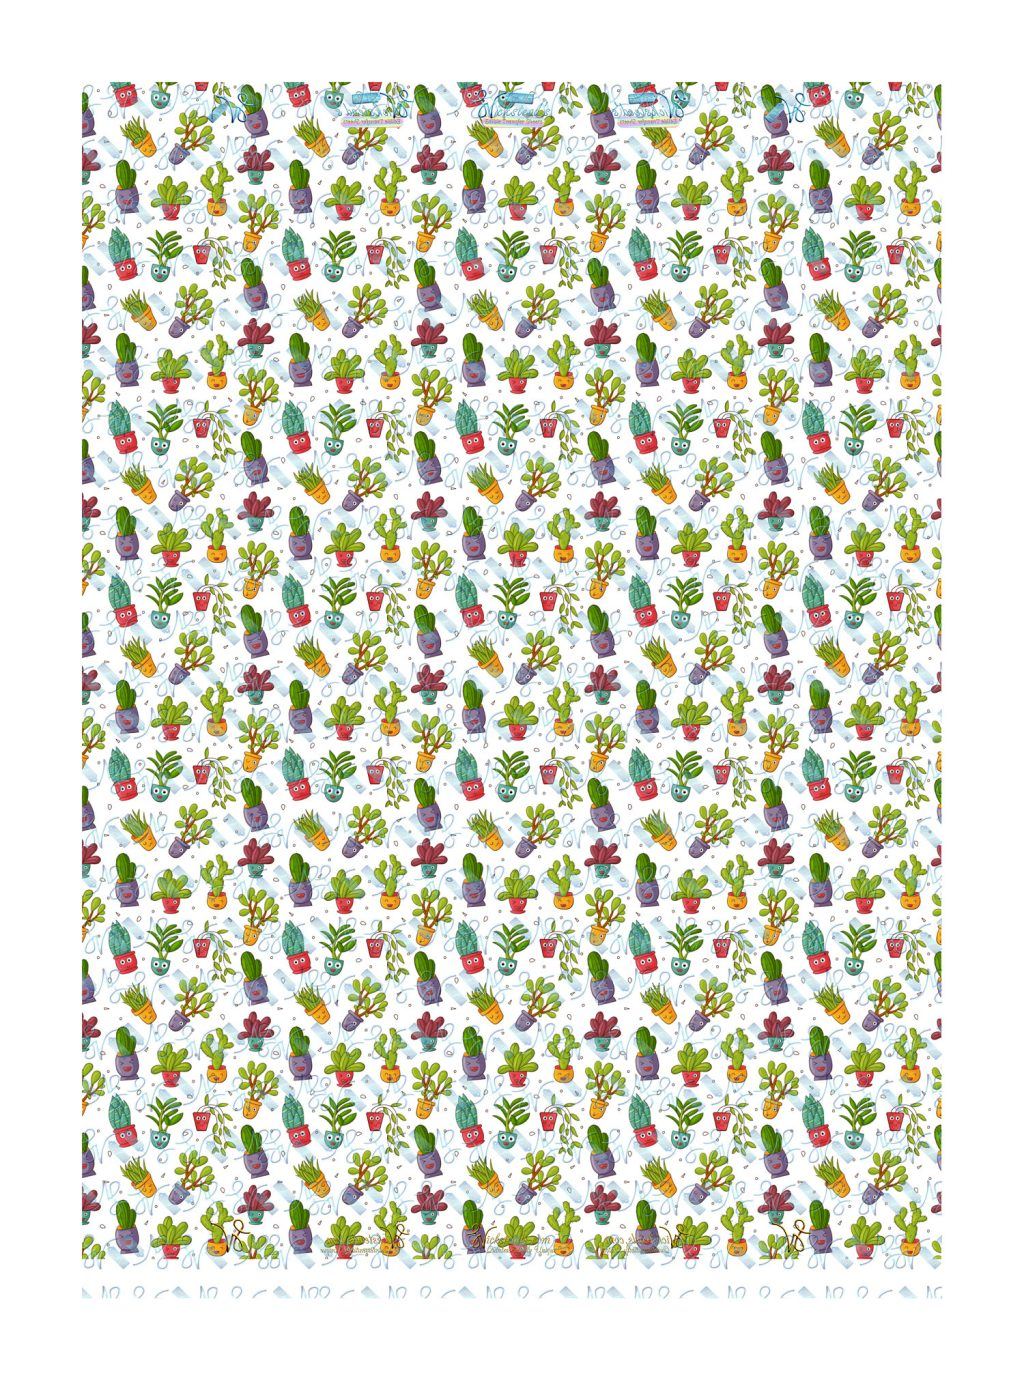 Wickstead's-Eat-Me-Edible-Meringue-Transfer-Sheets–Cute-Kawaii-Cacti-(8)